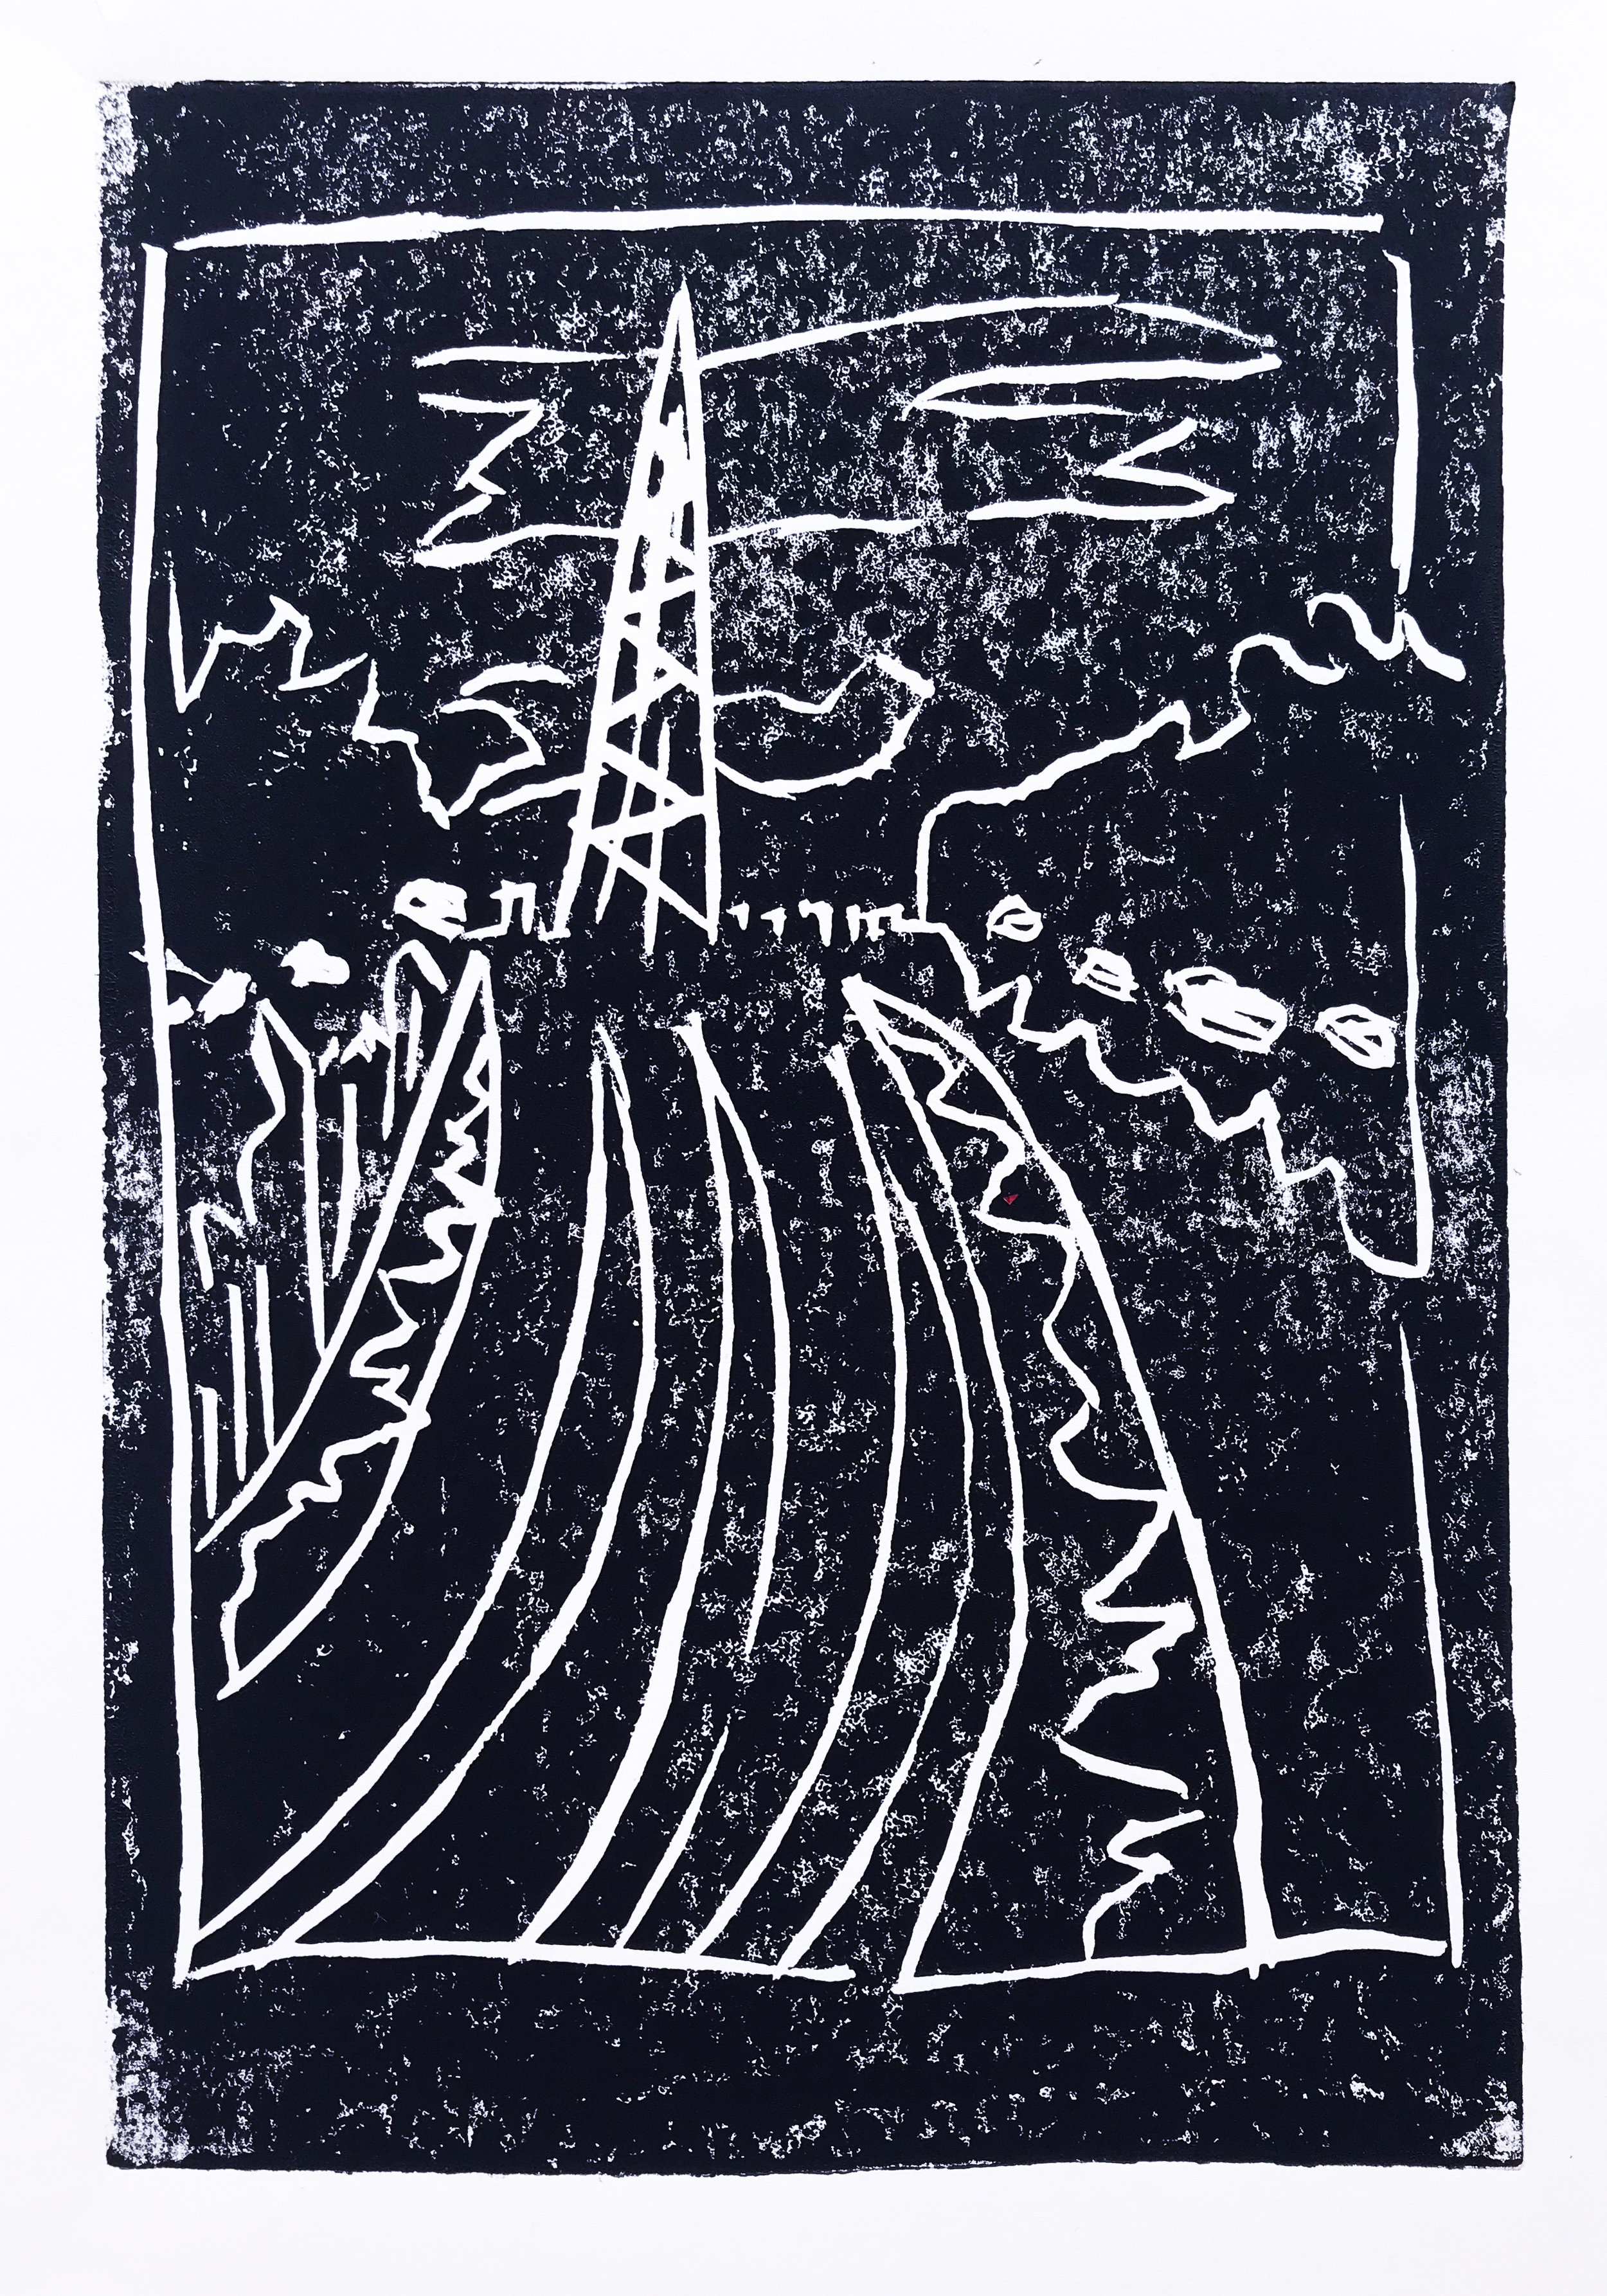 The Mast, 2019, linoprint on paper, 20 x 15 cm